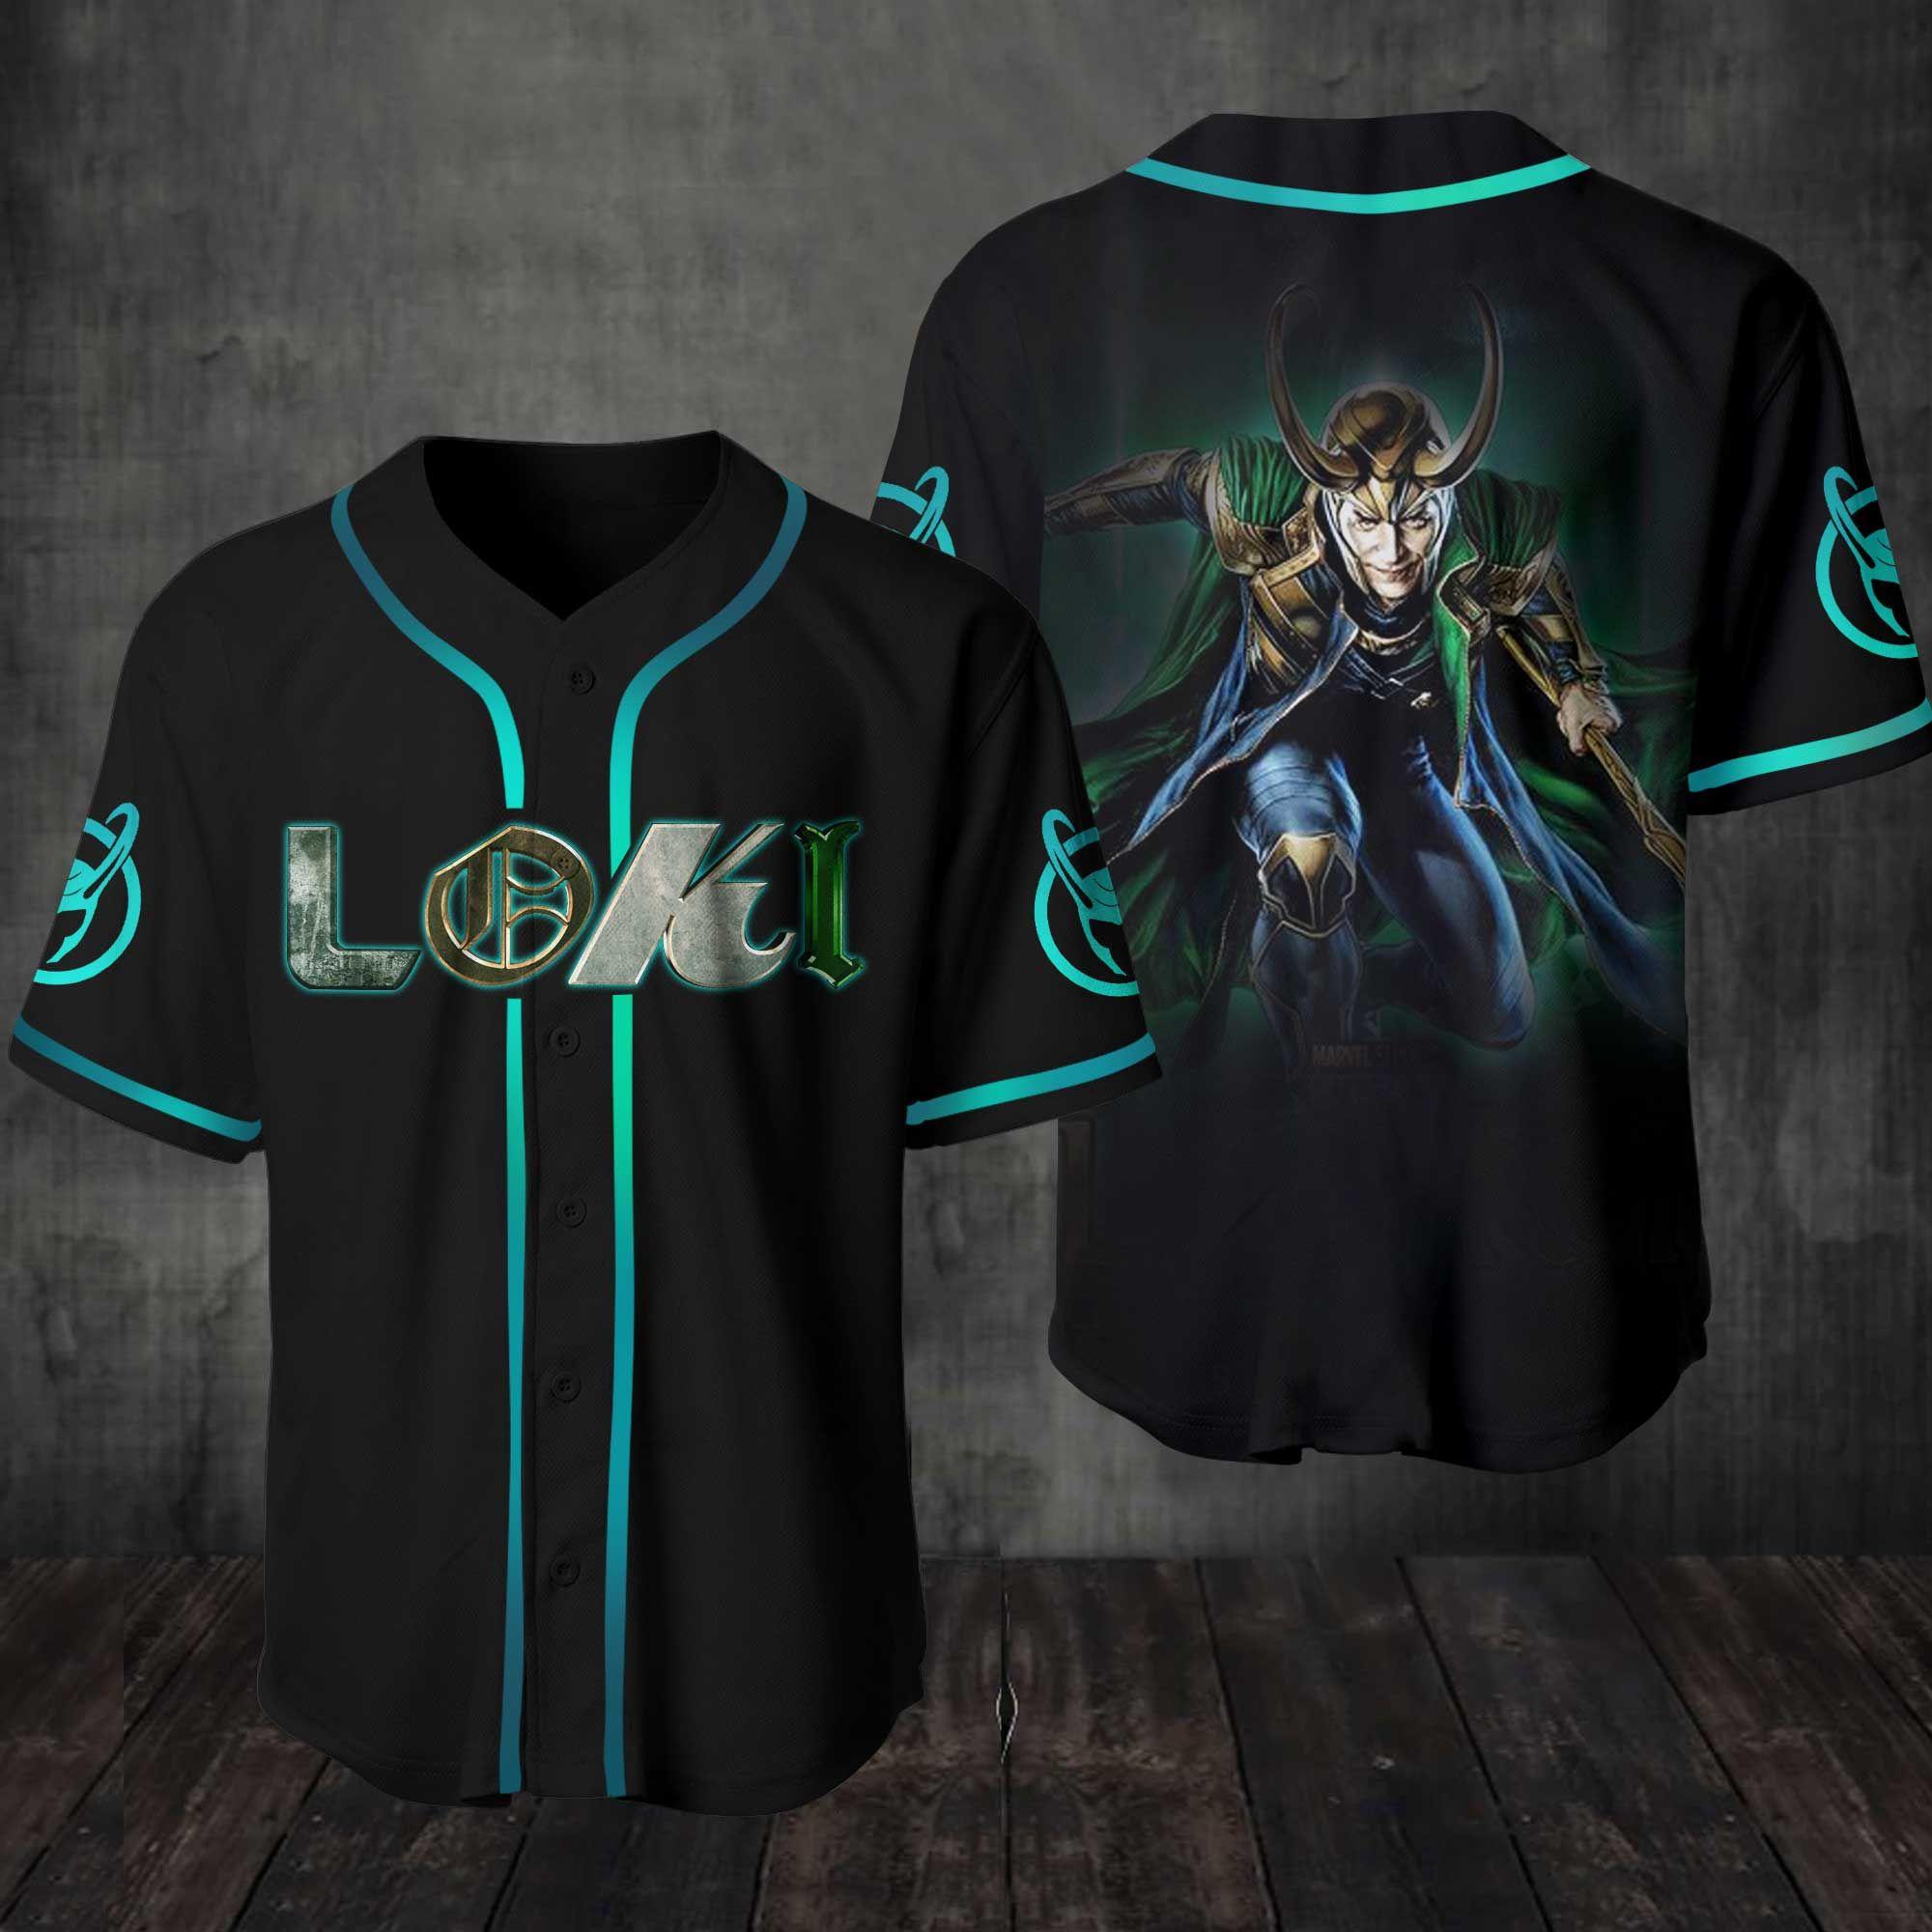 Loki Baseball Jersey shirt